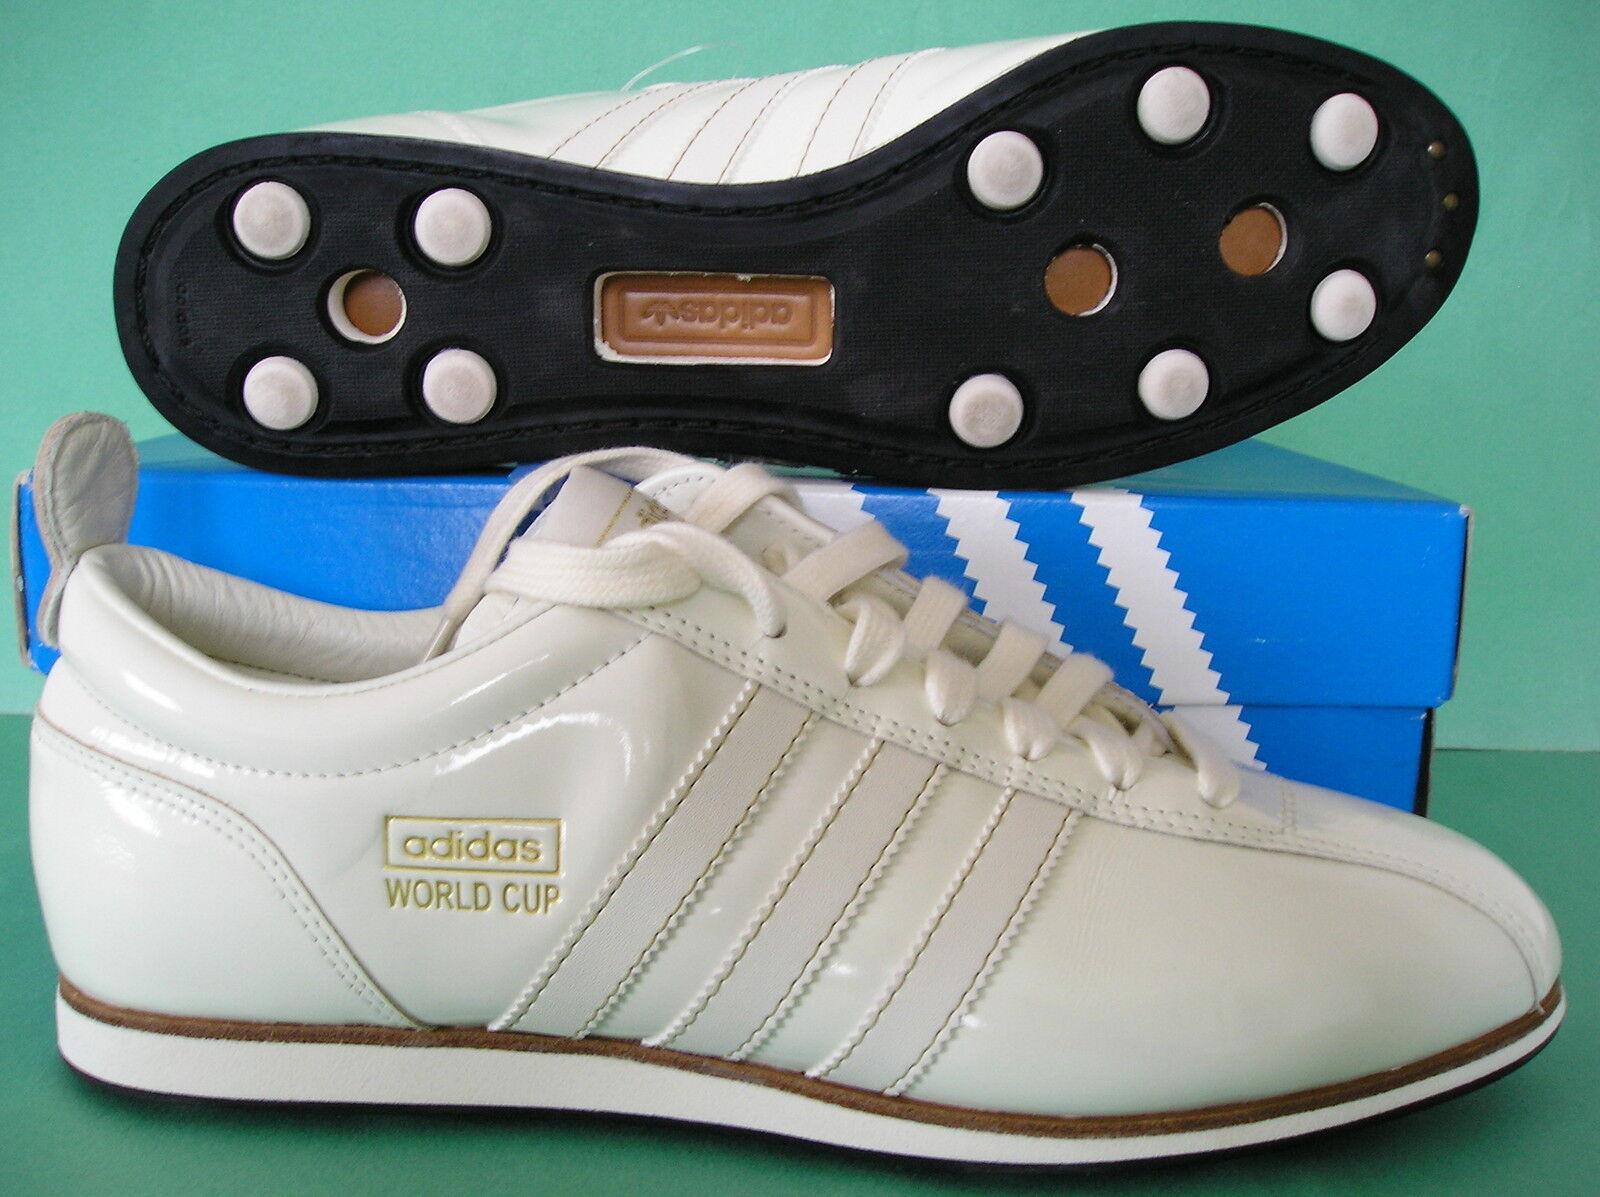 Sehr seltene vintage - adidas wm 66 schuh england samba - - samba gazelle, chile - mens 10,5 1afe69